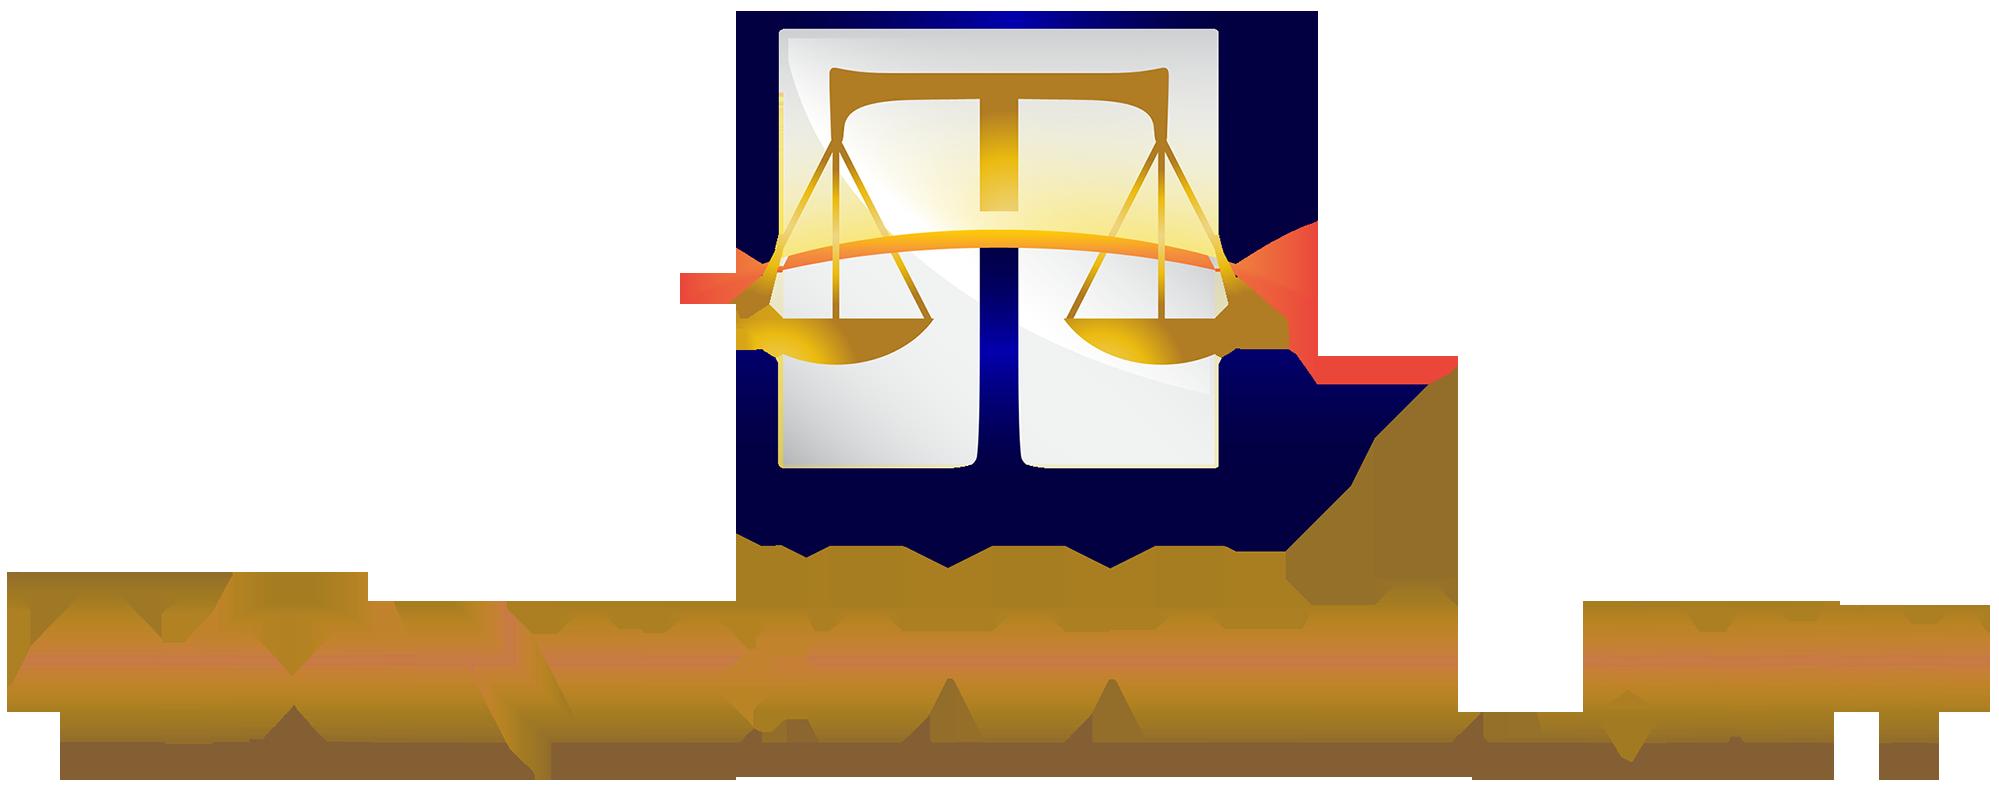 Crime clipart criminal lawyer. Tonelli law defending the